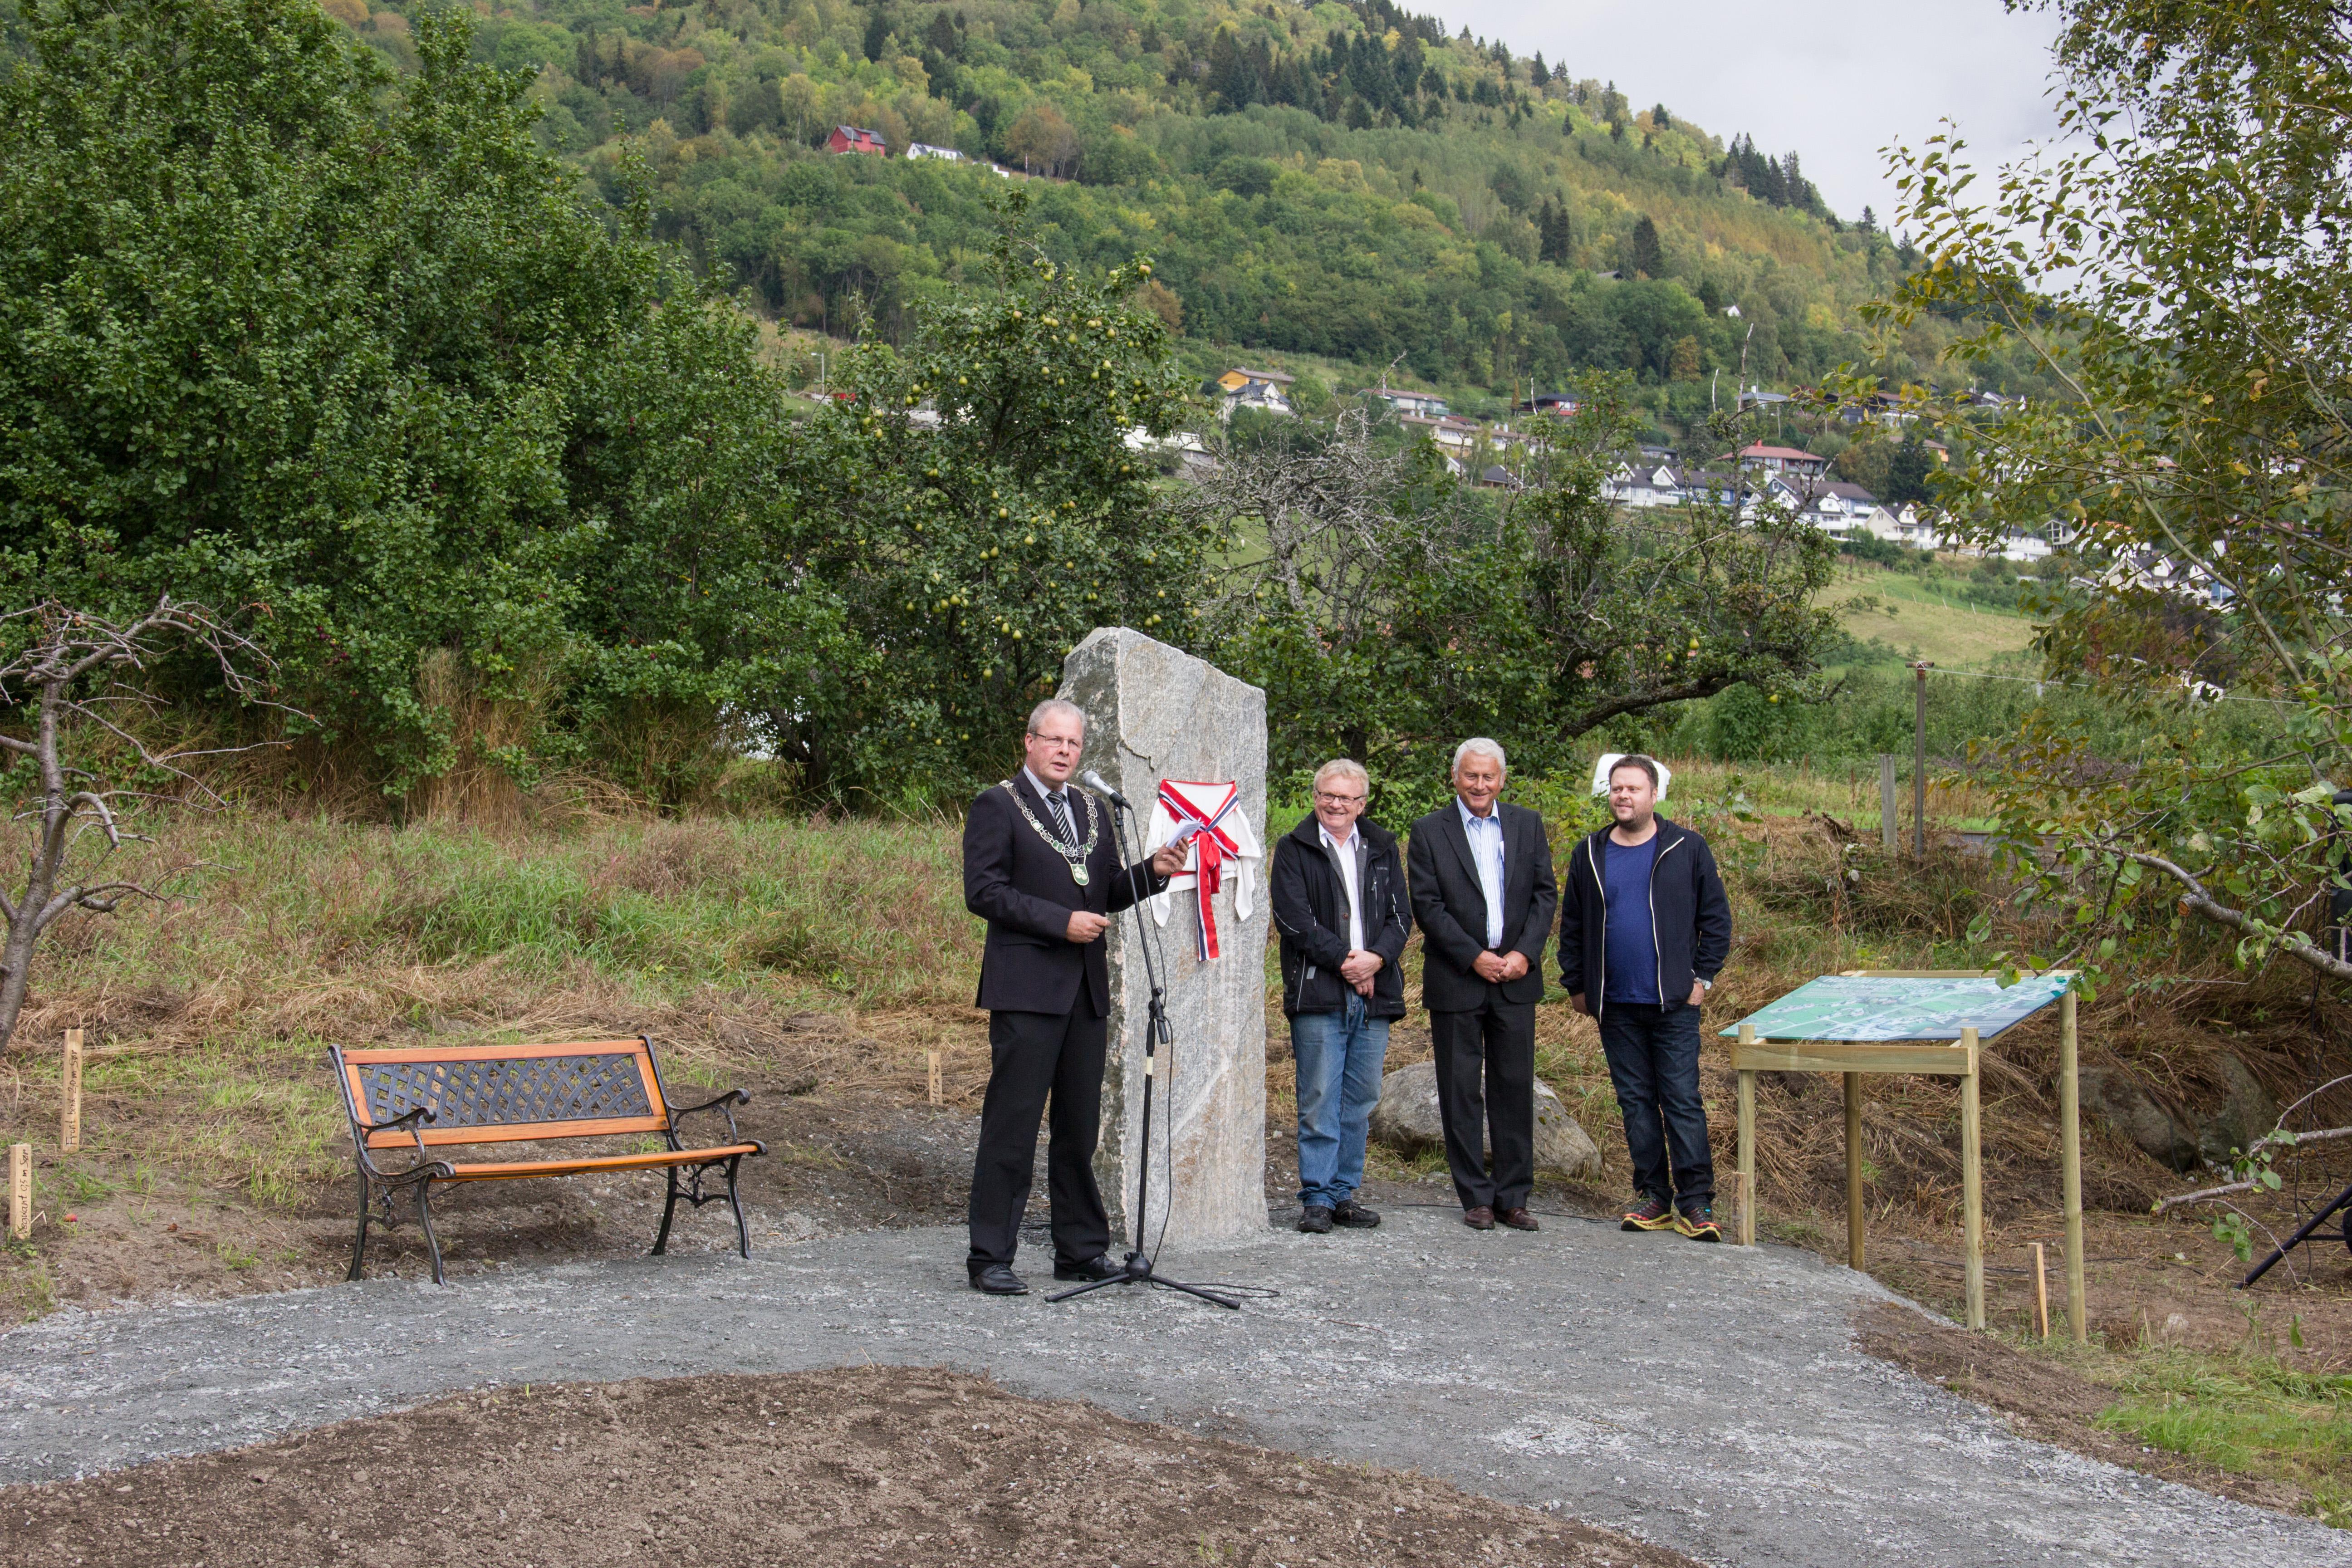 Ordførar Olav Lunden opna Hårfagreparken